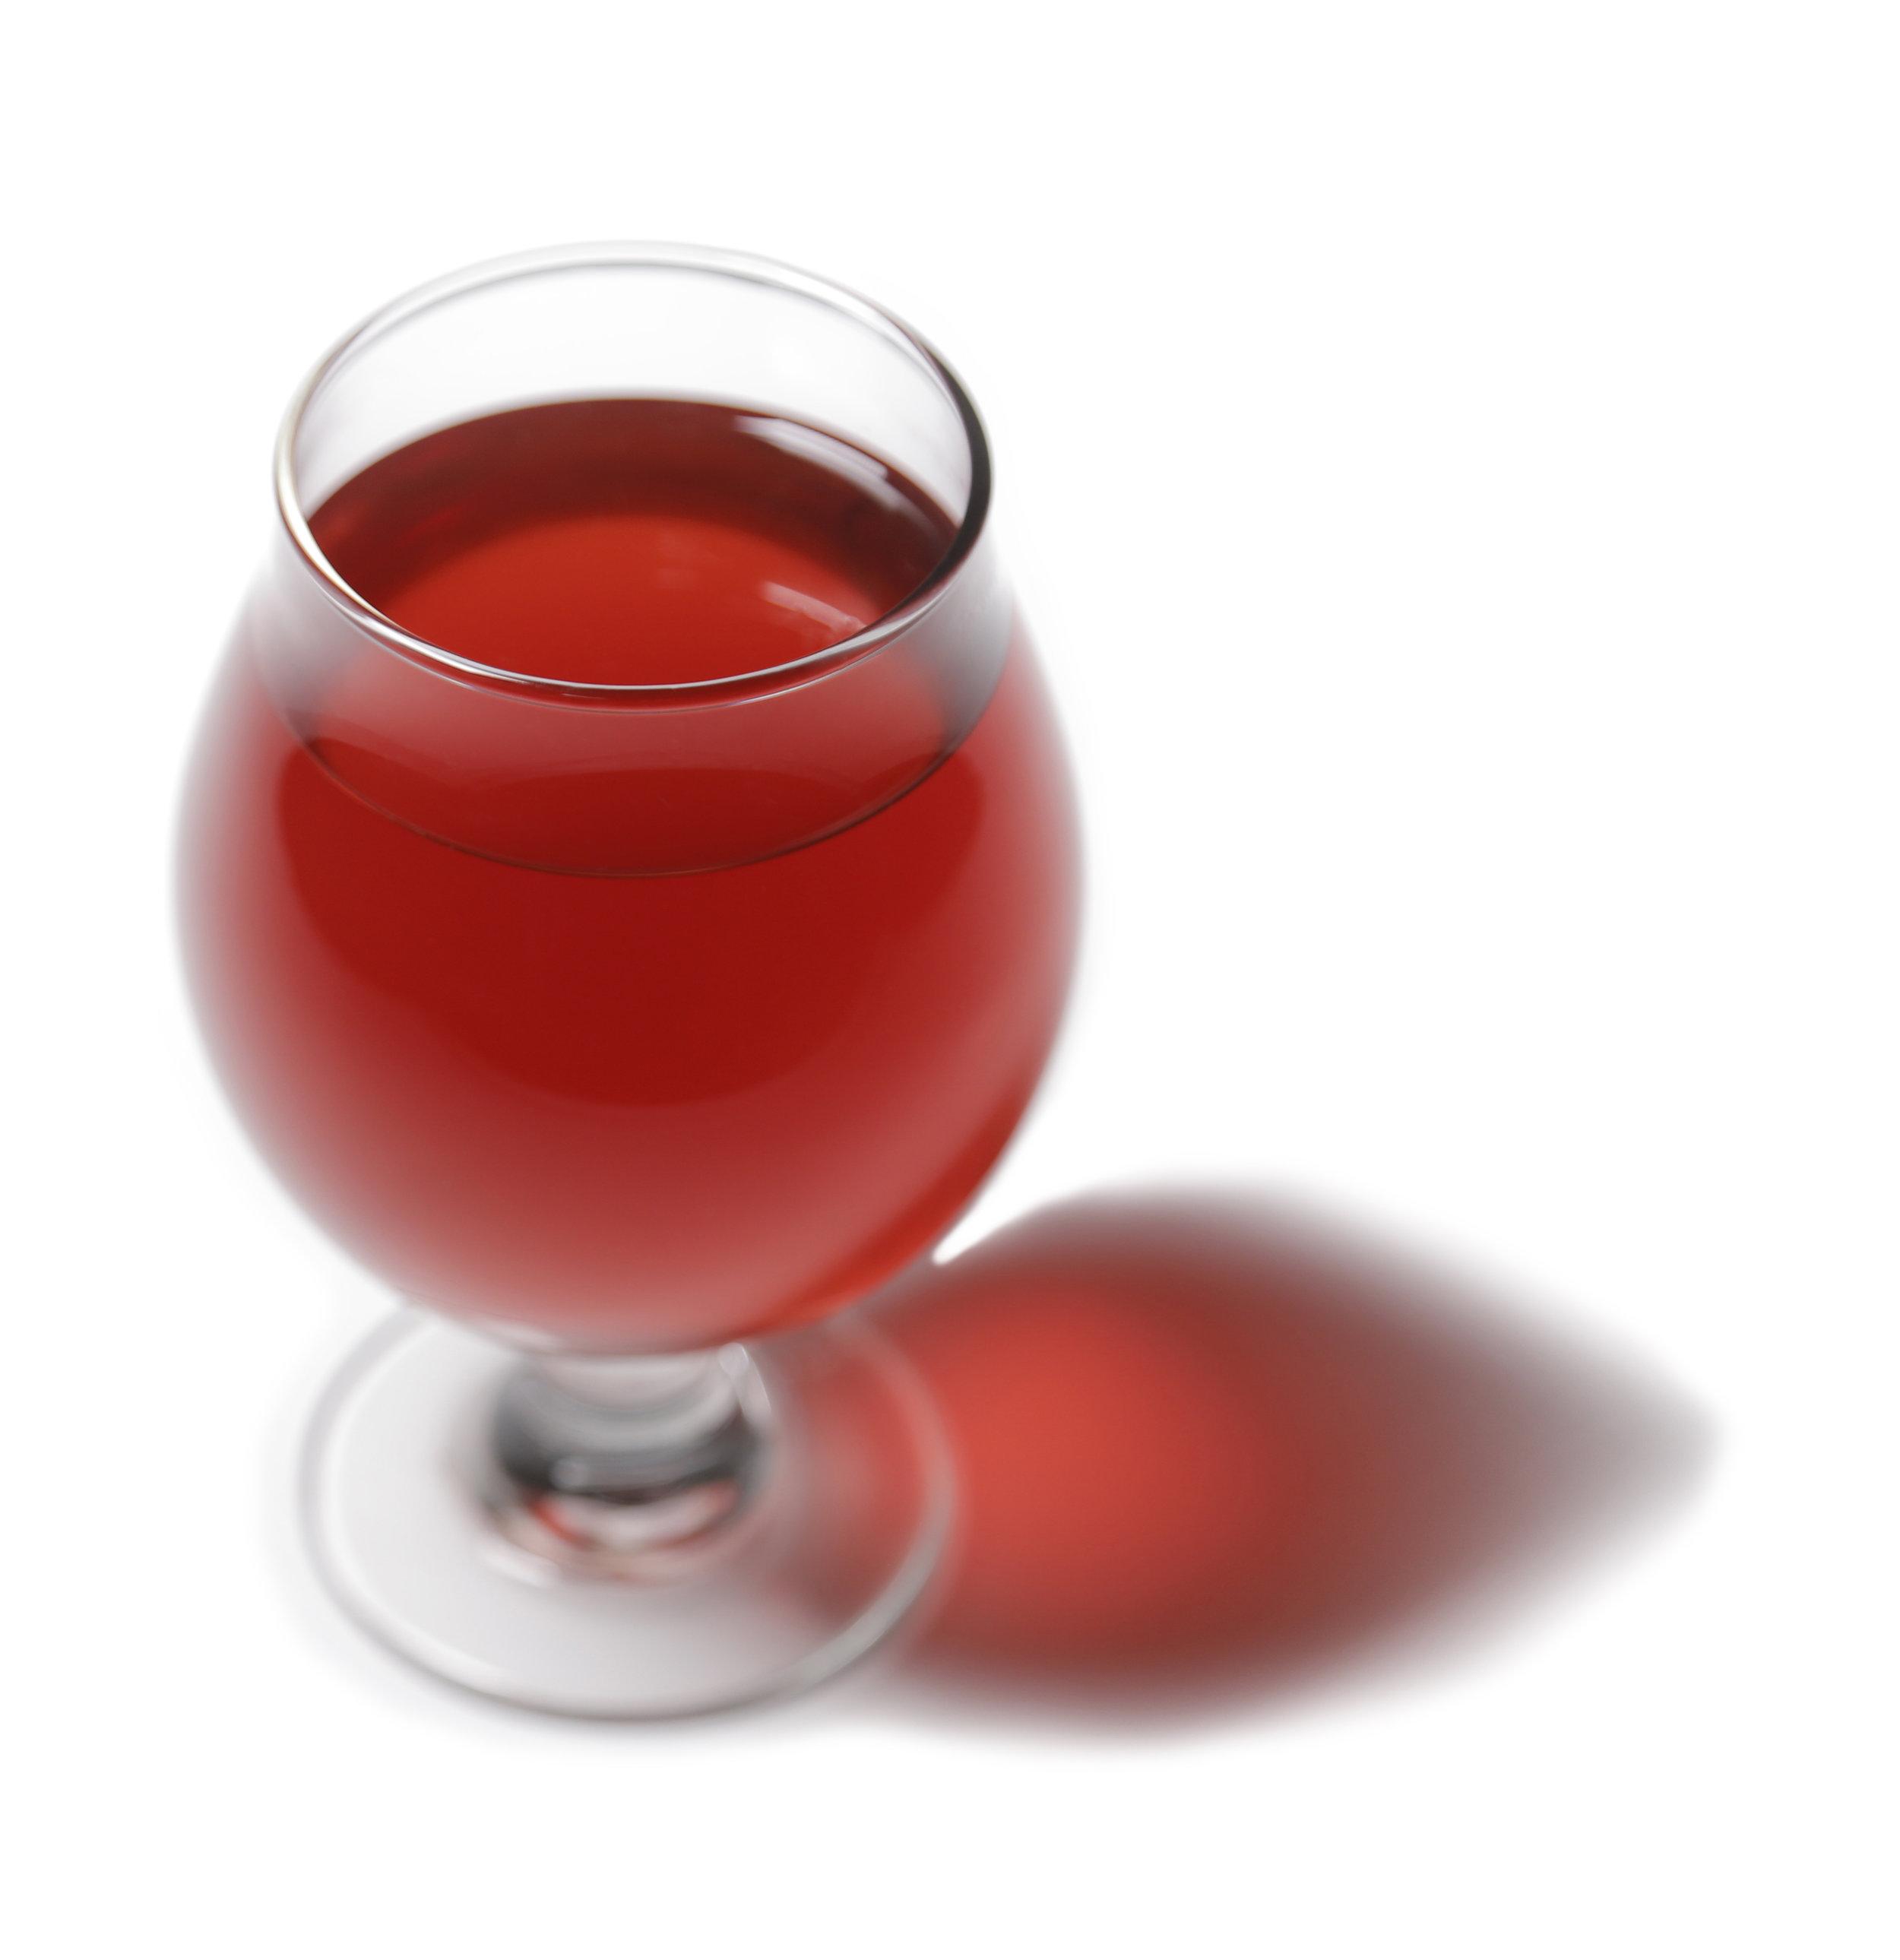 Strawberry Spruce Tip - PINE + FRUITY + BERRYFiltered Water, Organic Culture, Organic Cane Sugar, Organic White Peony Tea, Organic Dehydrated Strawberries, Wild Gustavus Spruce Tips